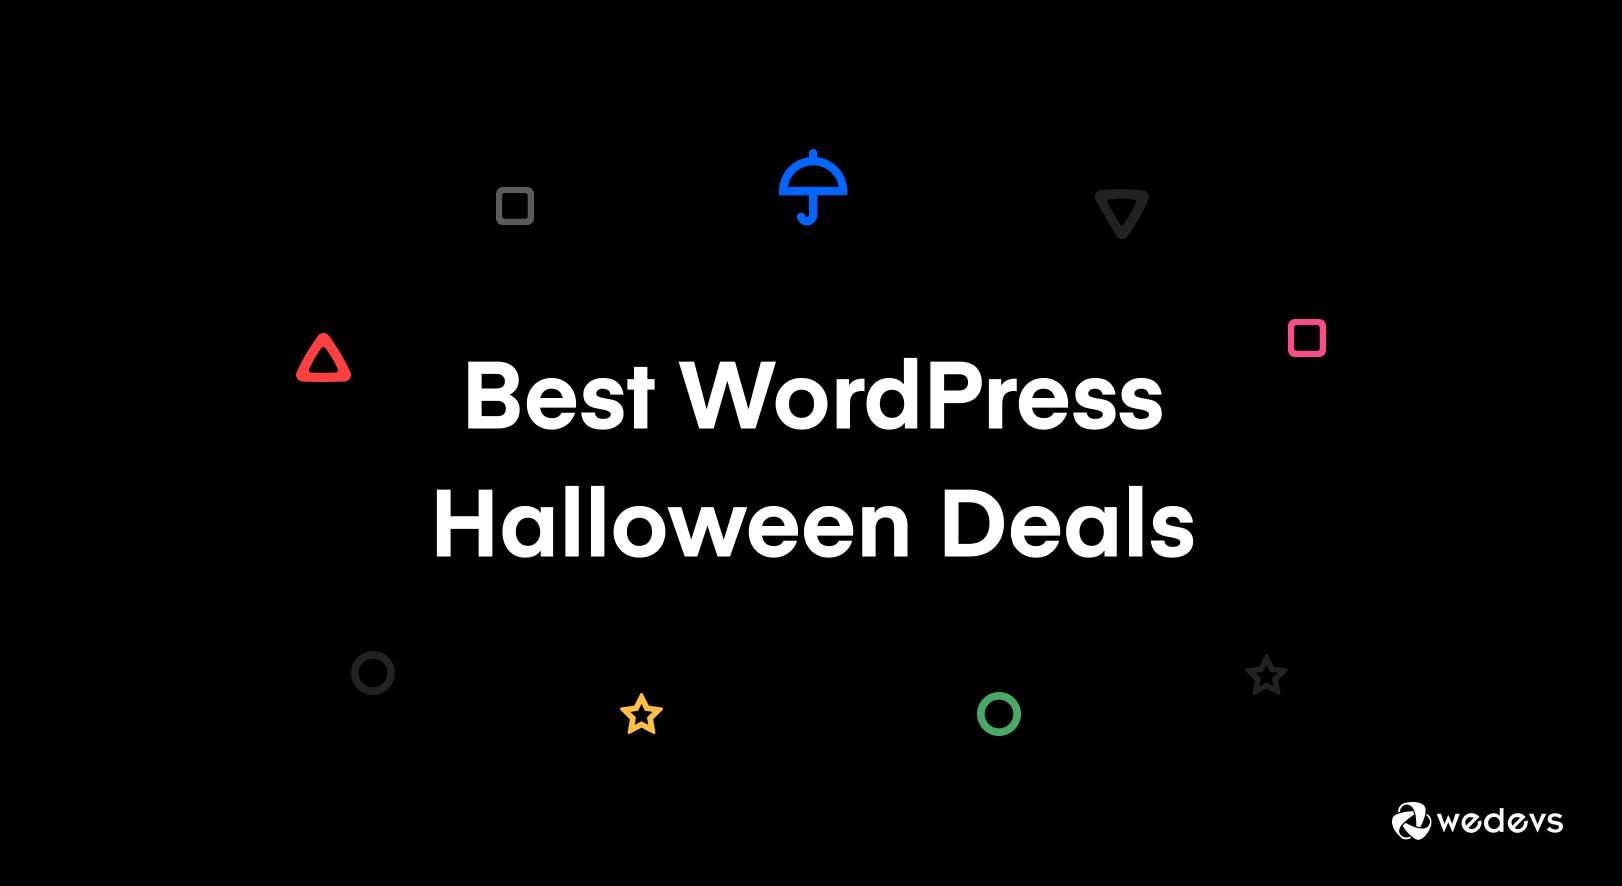 Best WordPress Halloween Deals 2021 (Hosting, Themes, Plugins, Marketing Tools & More!)